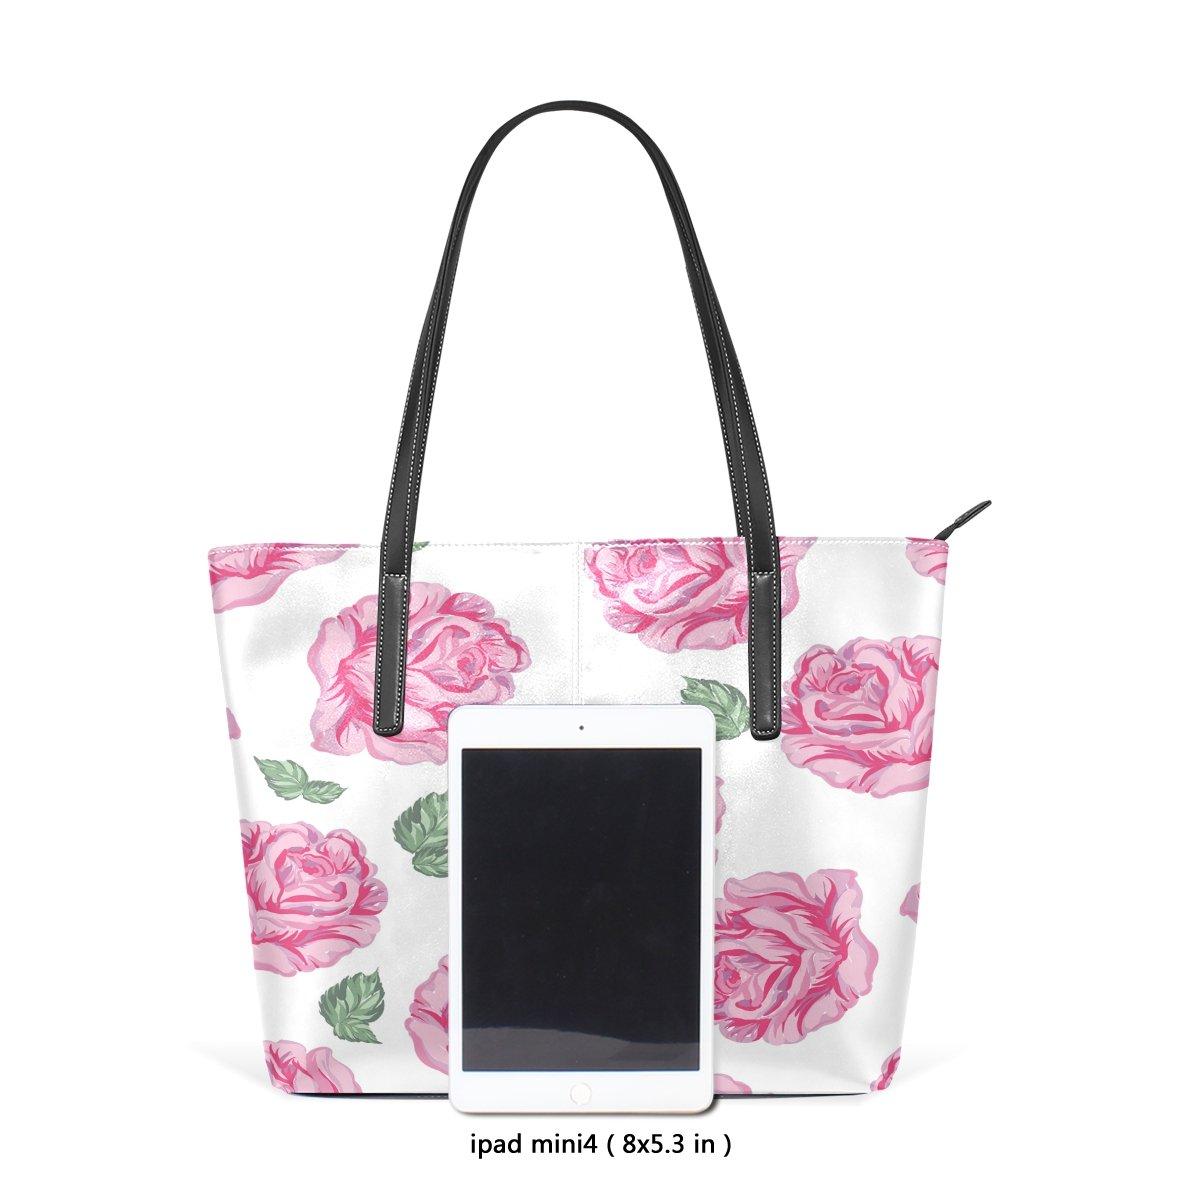 Womens Leather Top Handle Shoulder Handbag Pink Flowers Large Work Tote Bag